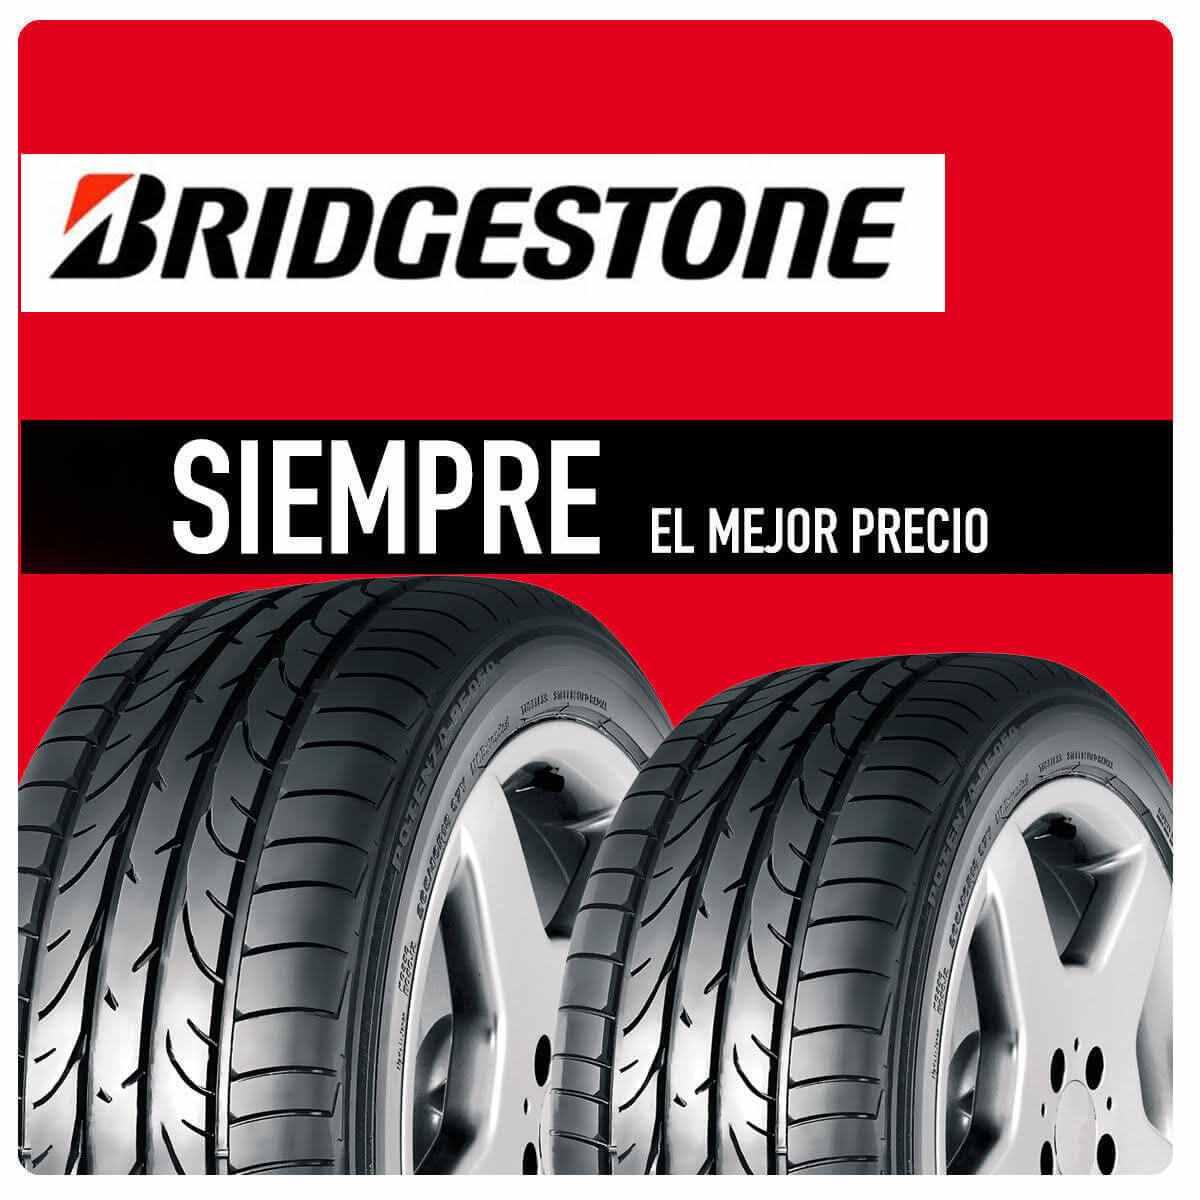 Neumáticos Bridgestone en Madrid